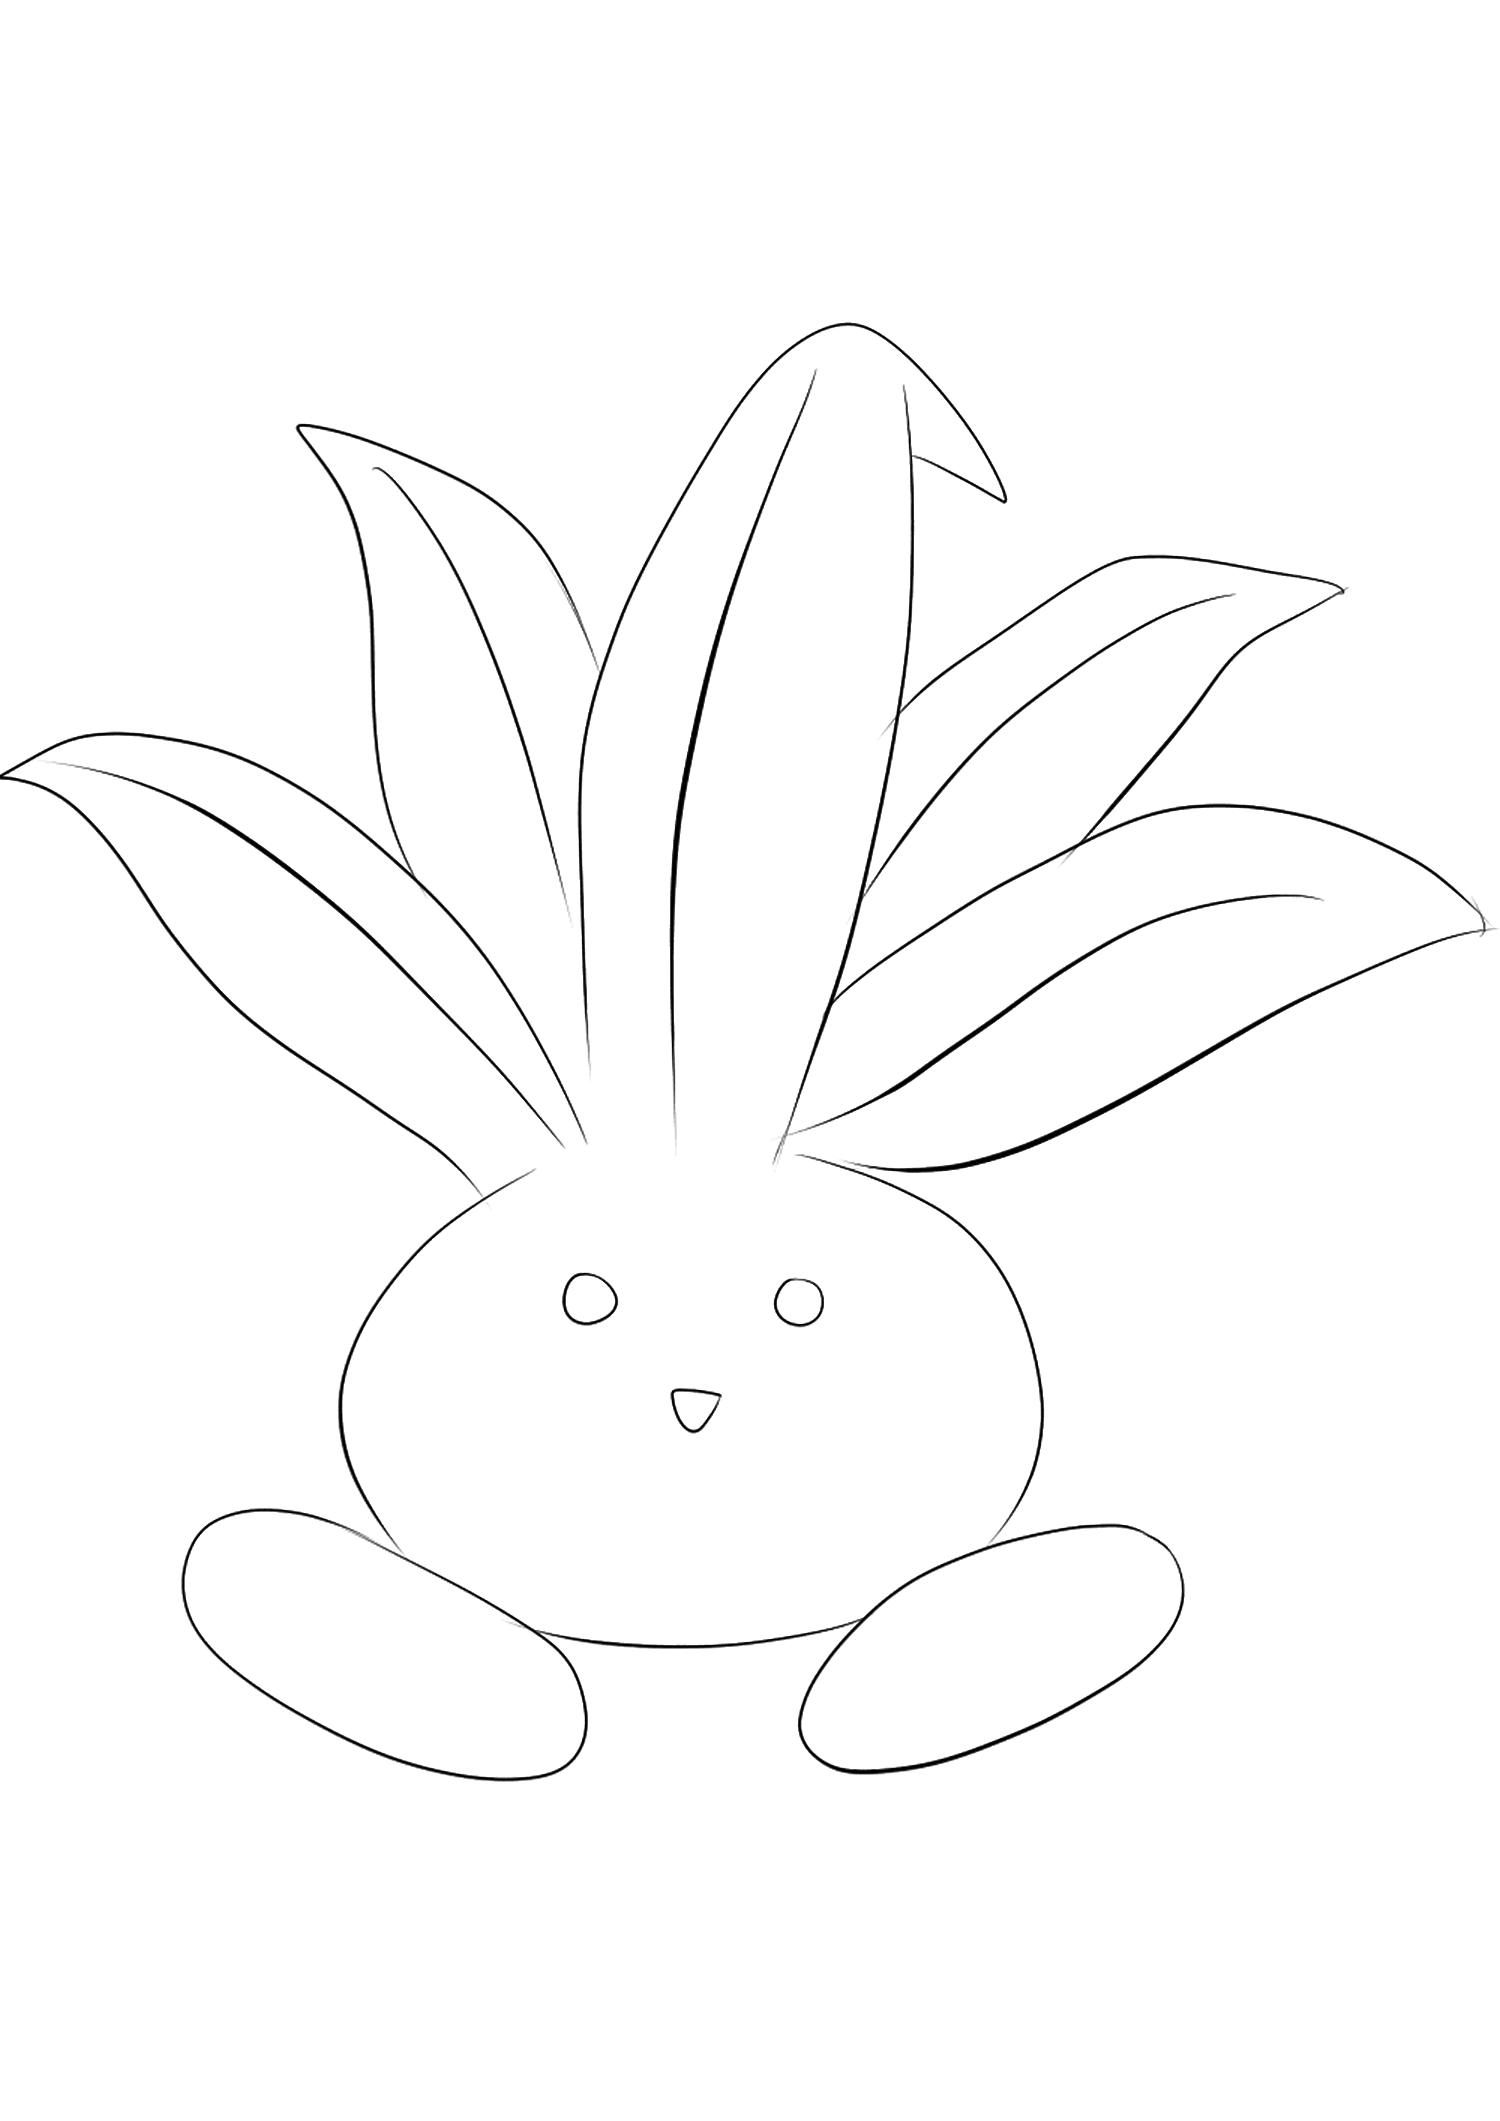 <b>Mystherbe</b> (No.43) : Pokémon de génération I